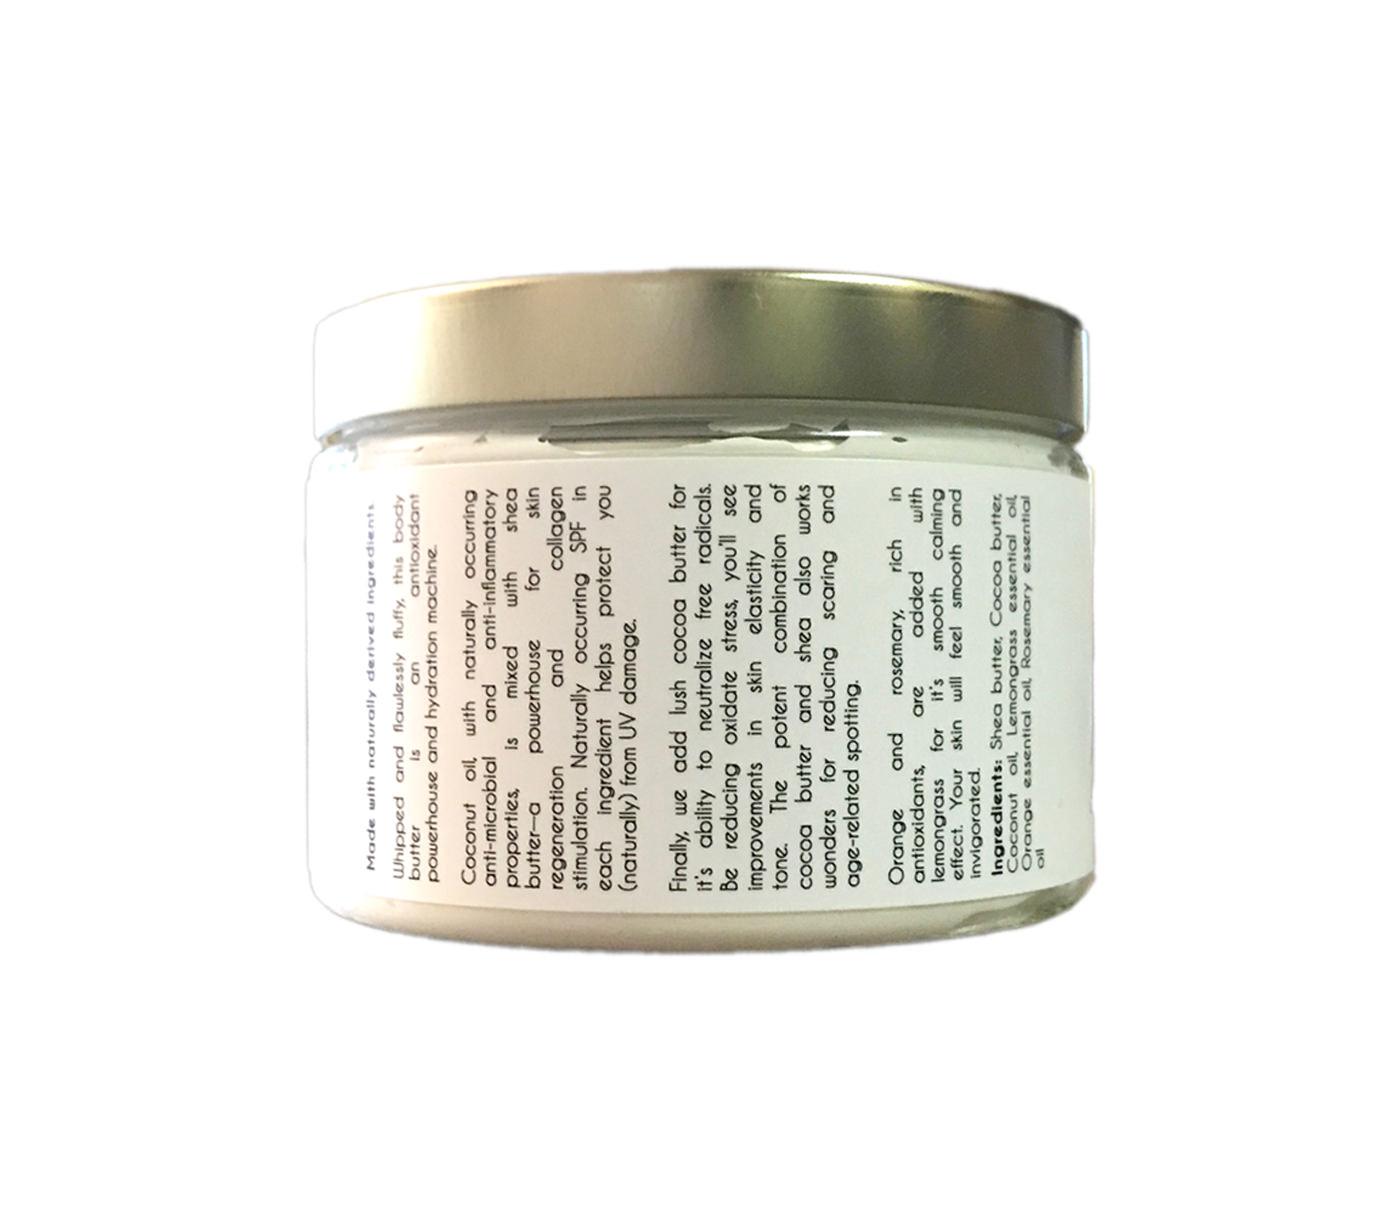 citrus-herb-bath-butter-organic-skincare-herbal-natural-body-butter.jpg